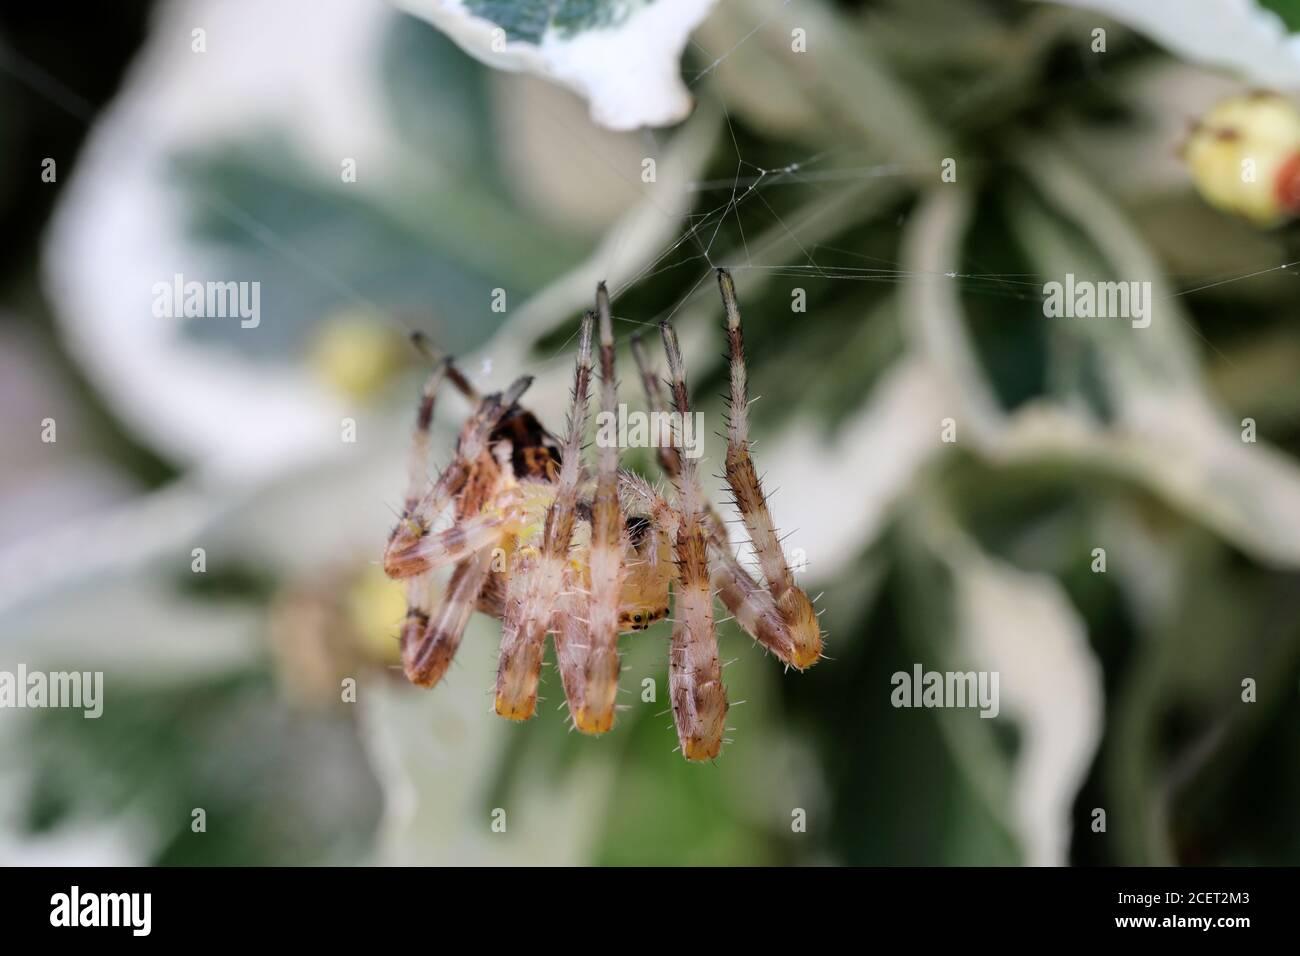 Common Garden Spider Araneus diadematus tissage de son Web, Angleterre Royaume-Uni Banque D'Images